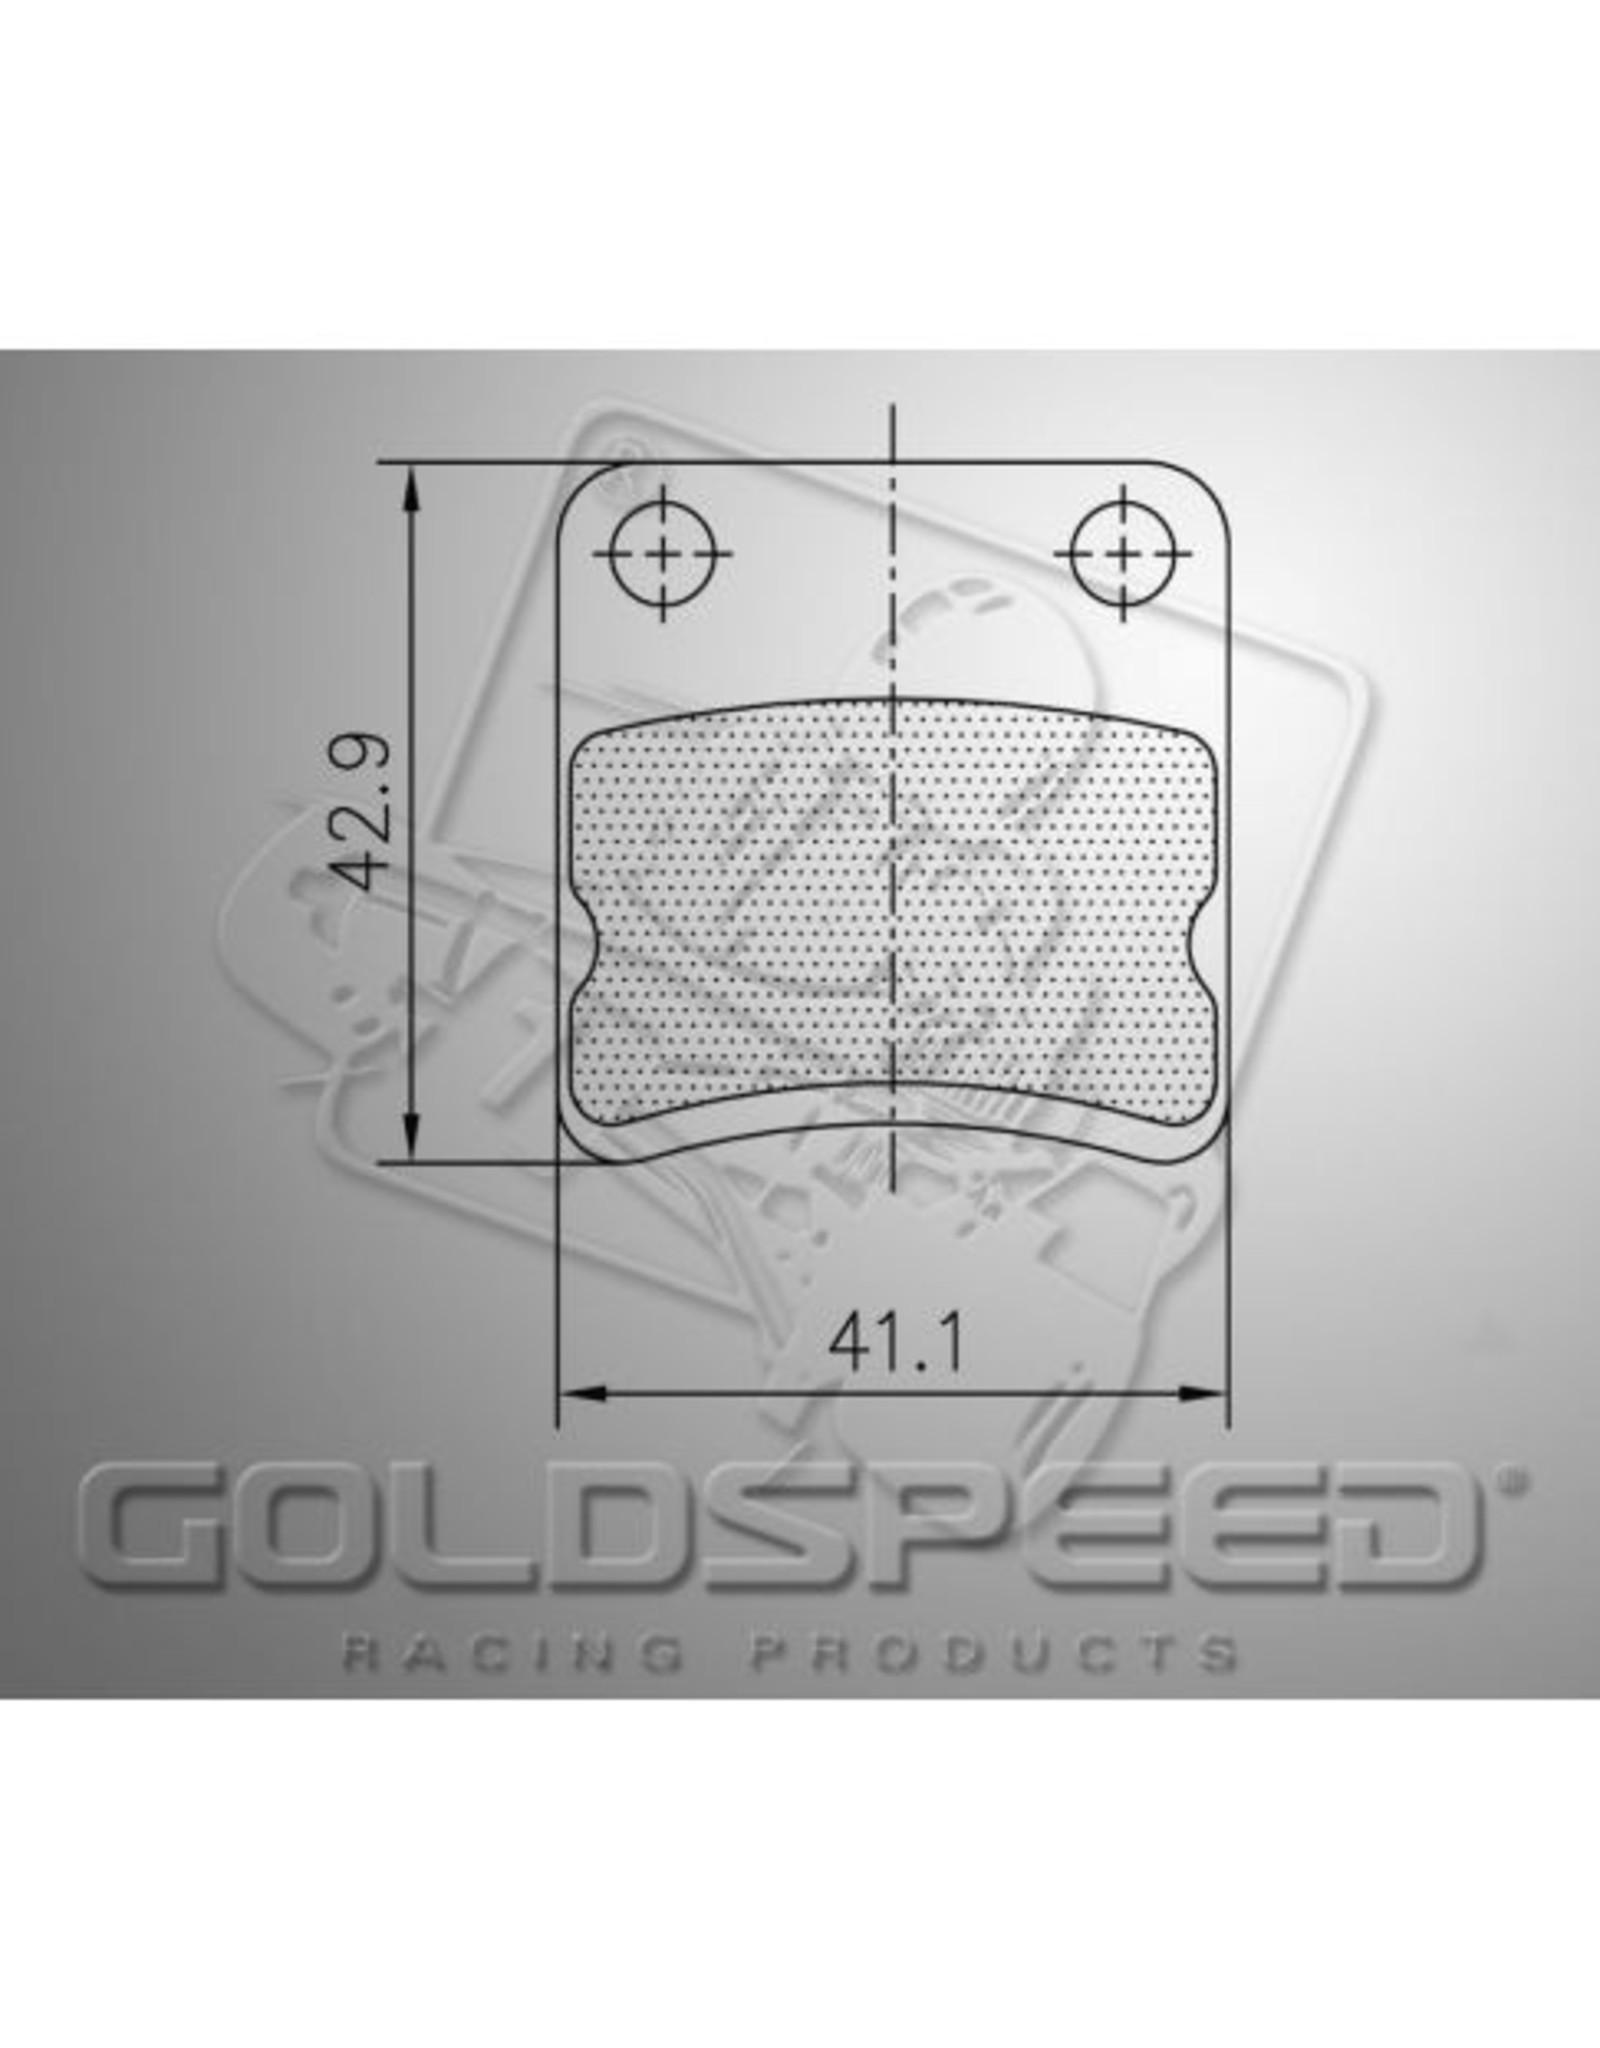 Goldspeed Goldspeed remblokset parolin / energy /first kart voor